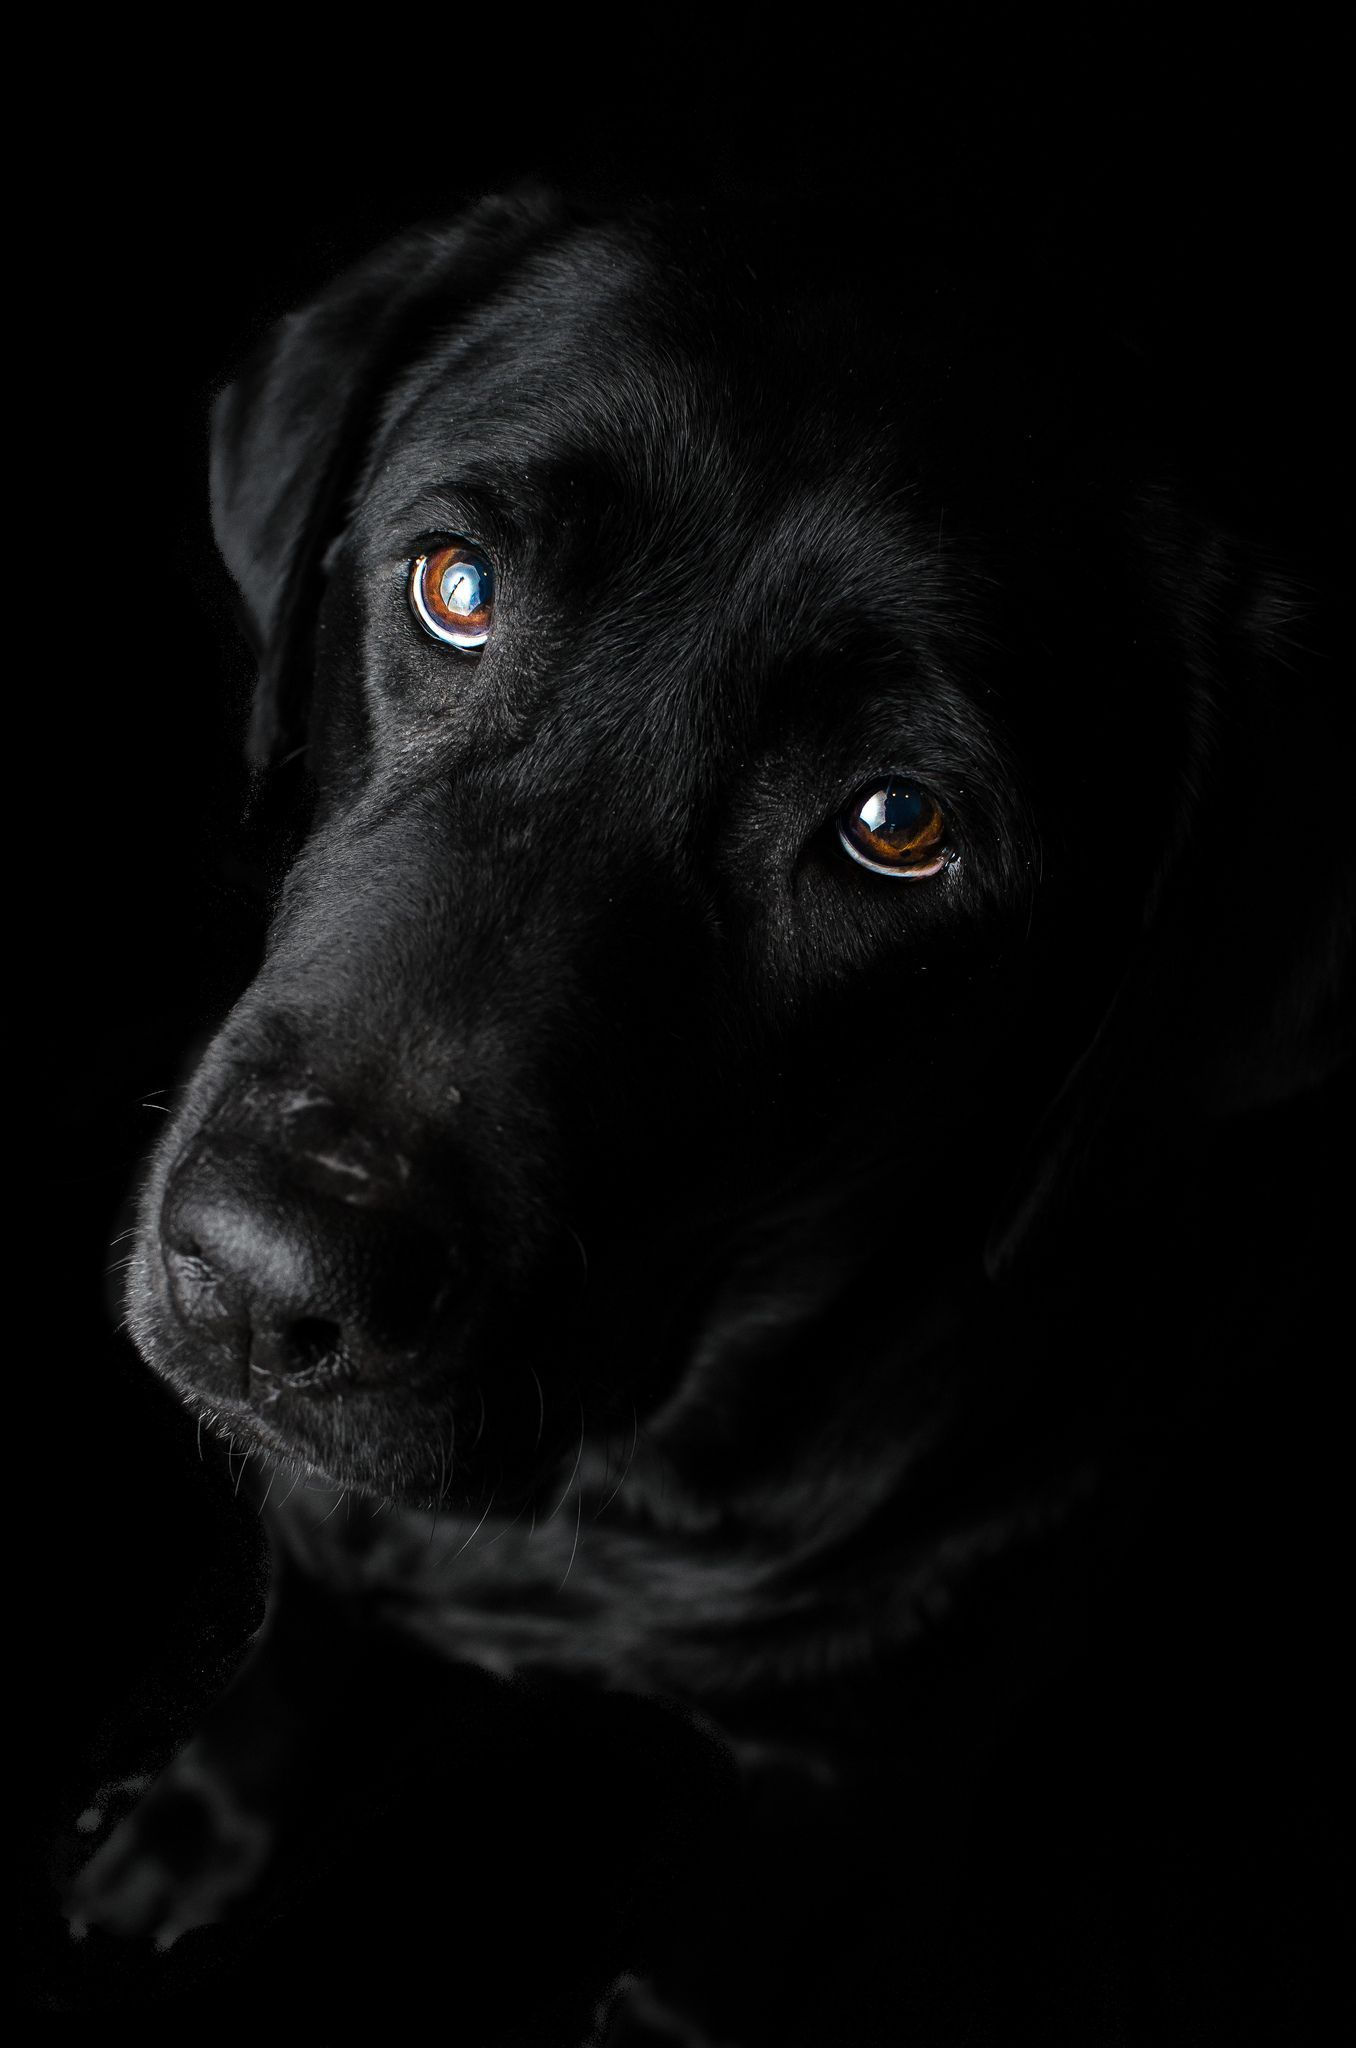 Abby 49 53 Black Is Beautiful Flickr Photo Sharing Labradorretriever Labrador Retriever Coole Hunde Schwarze Hunde